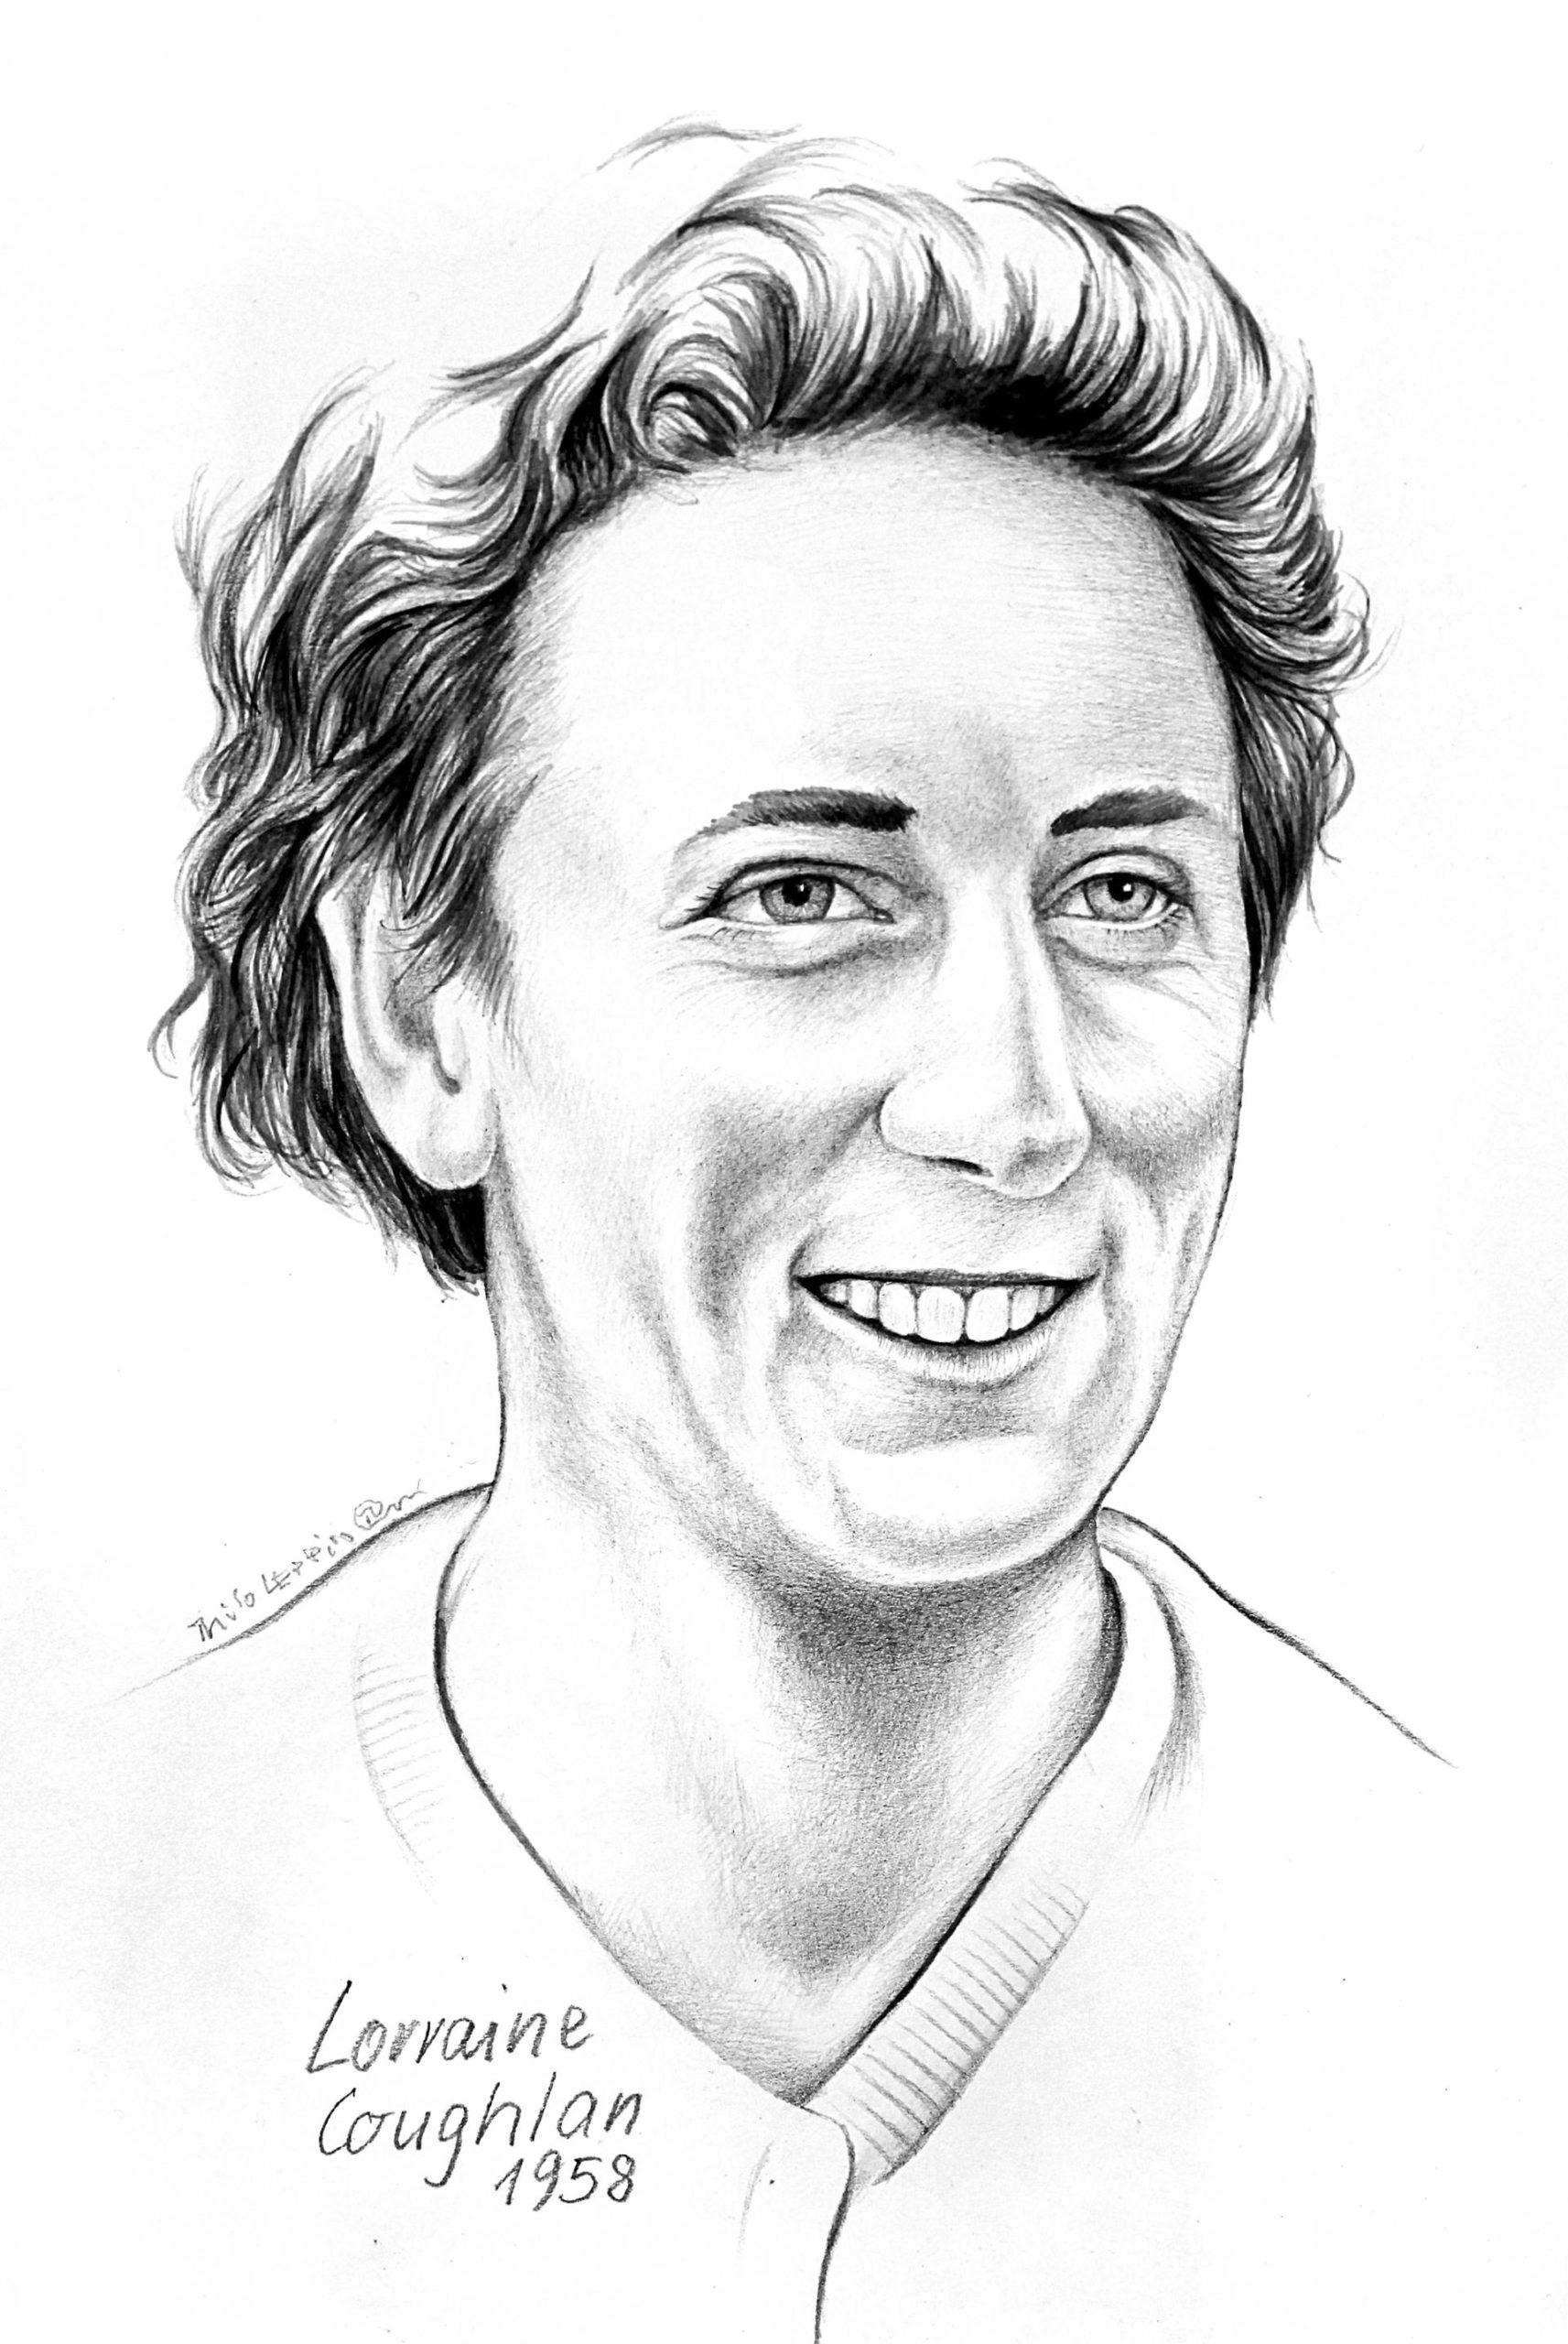 Lorraine Coghlan